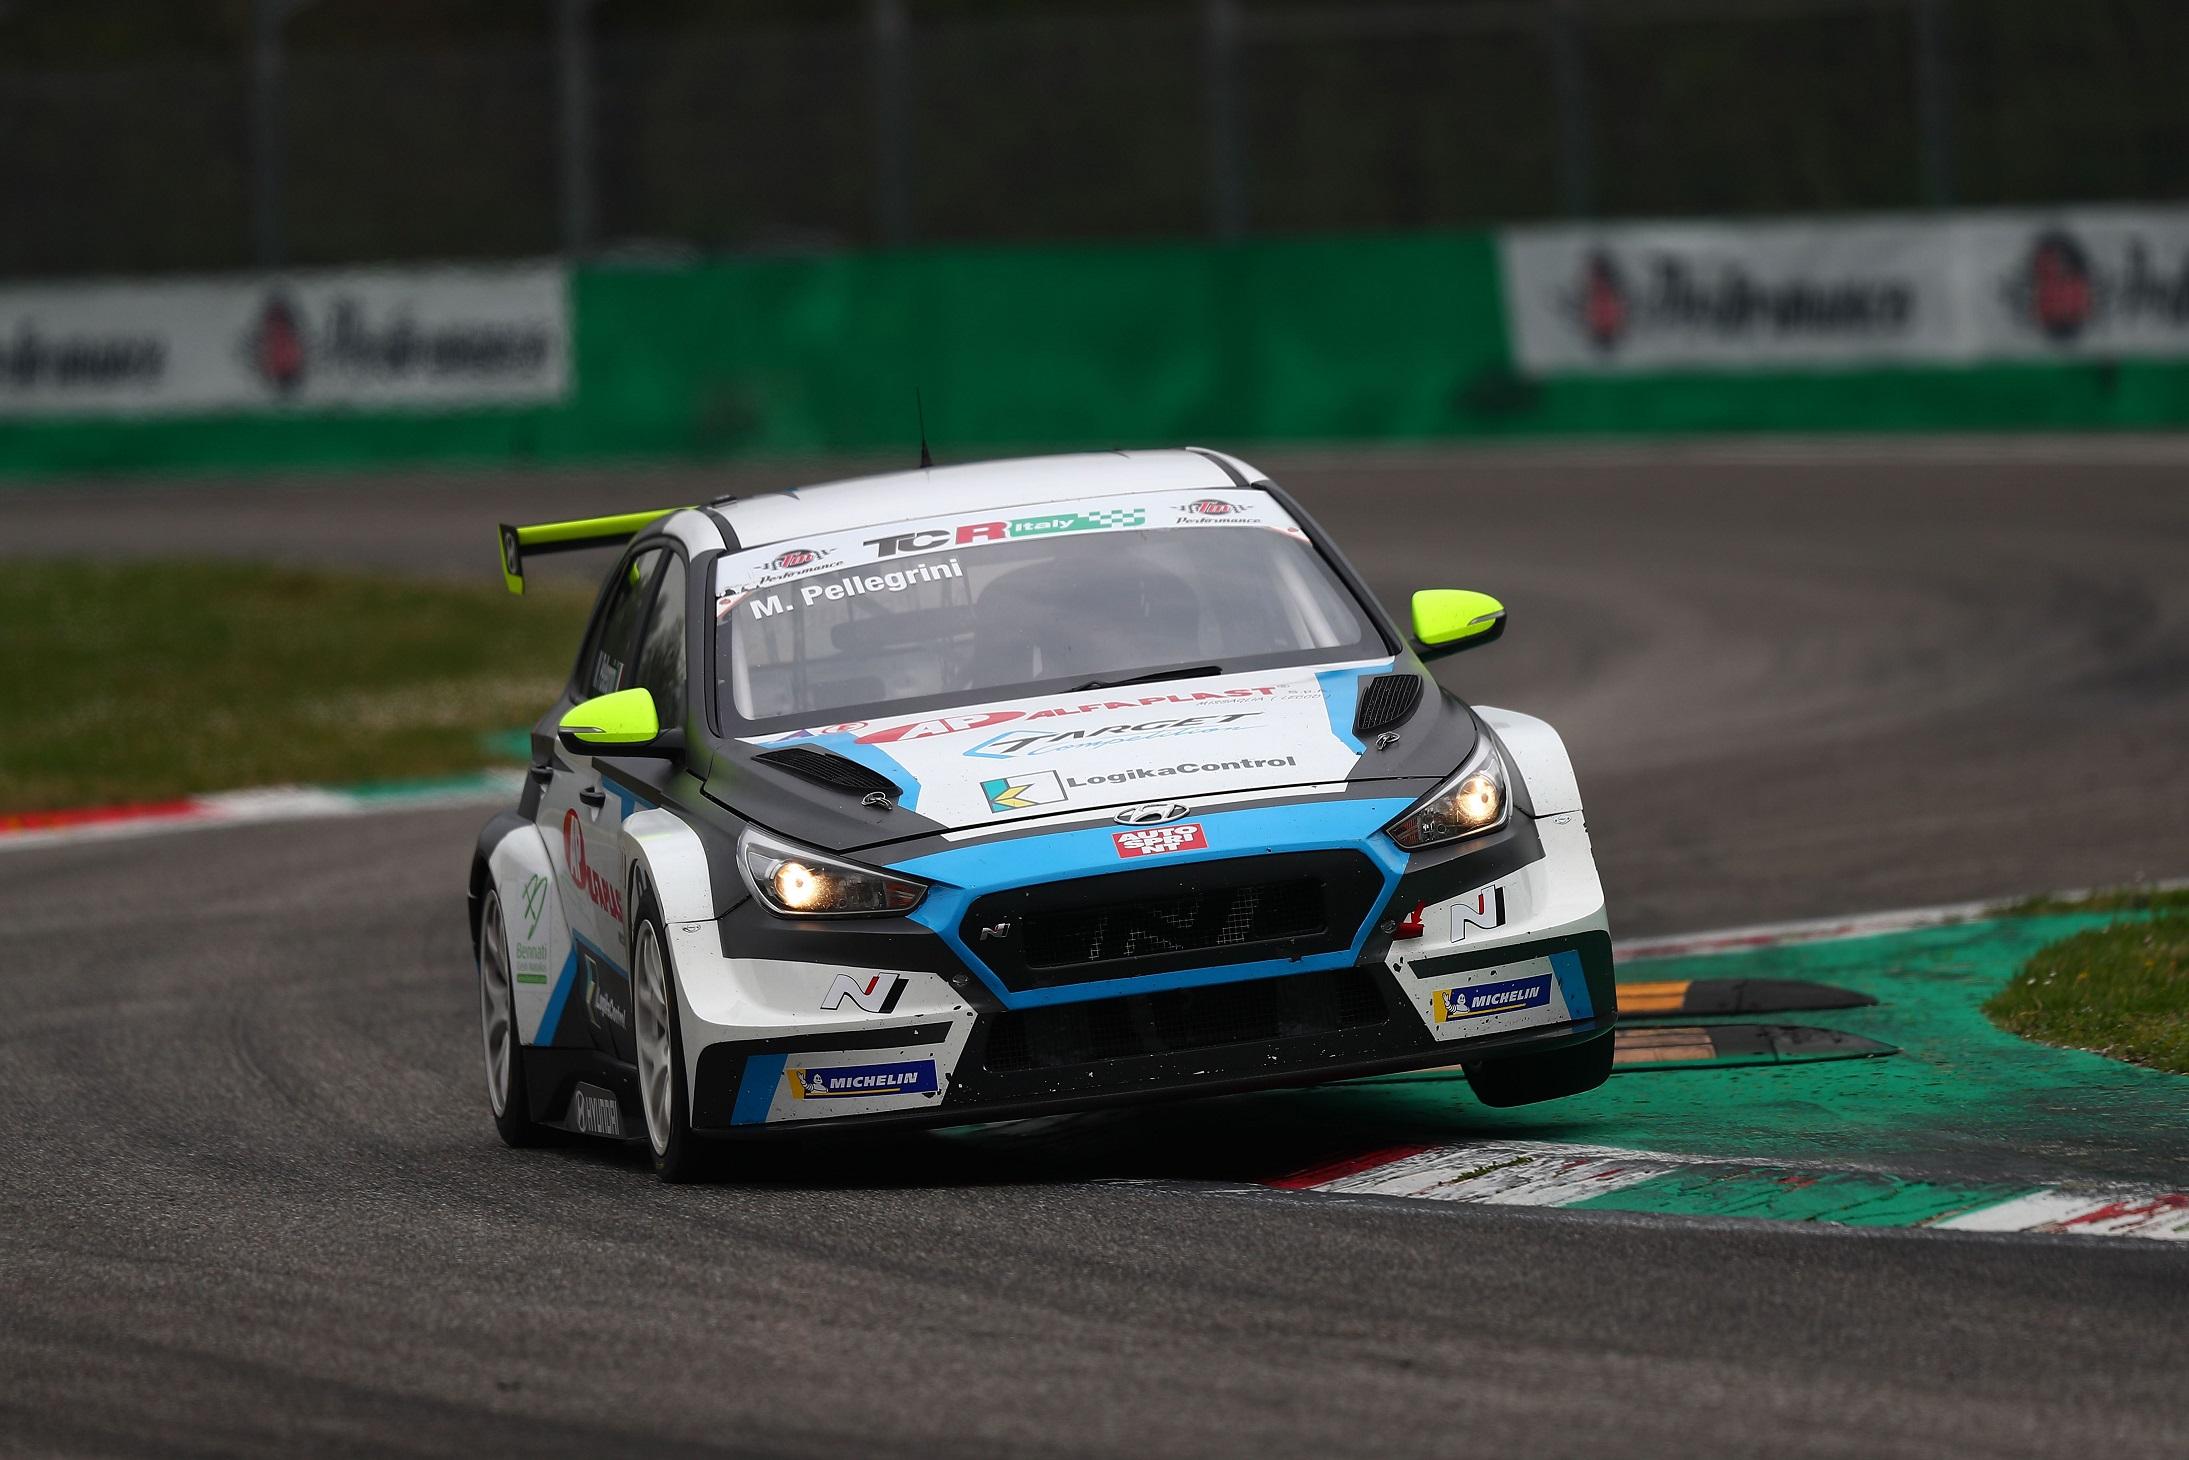 Marco Pellegrini Anatrella (Target Competition,Hyundai i30 N TCR #67)